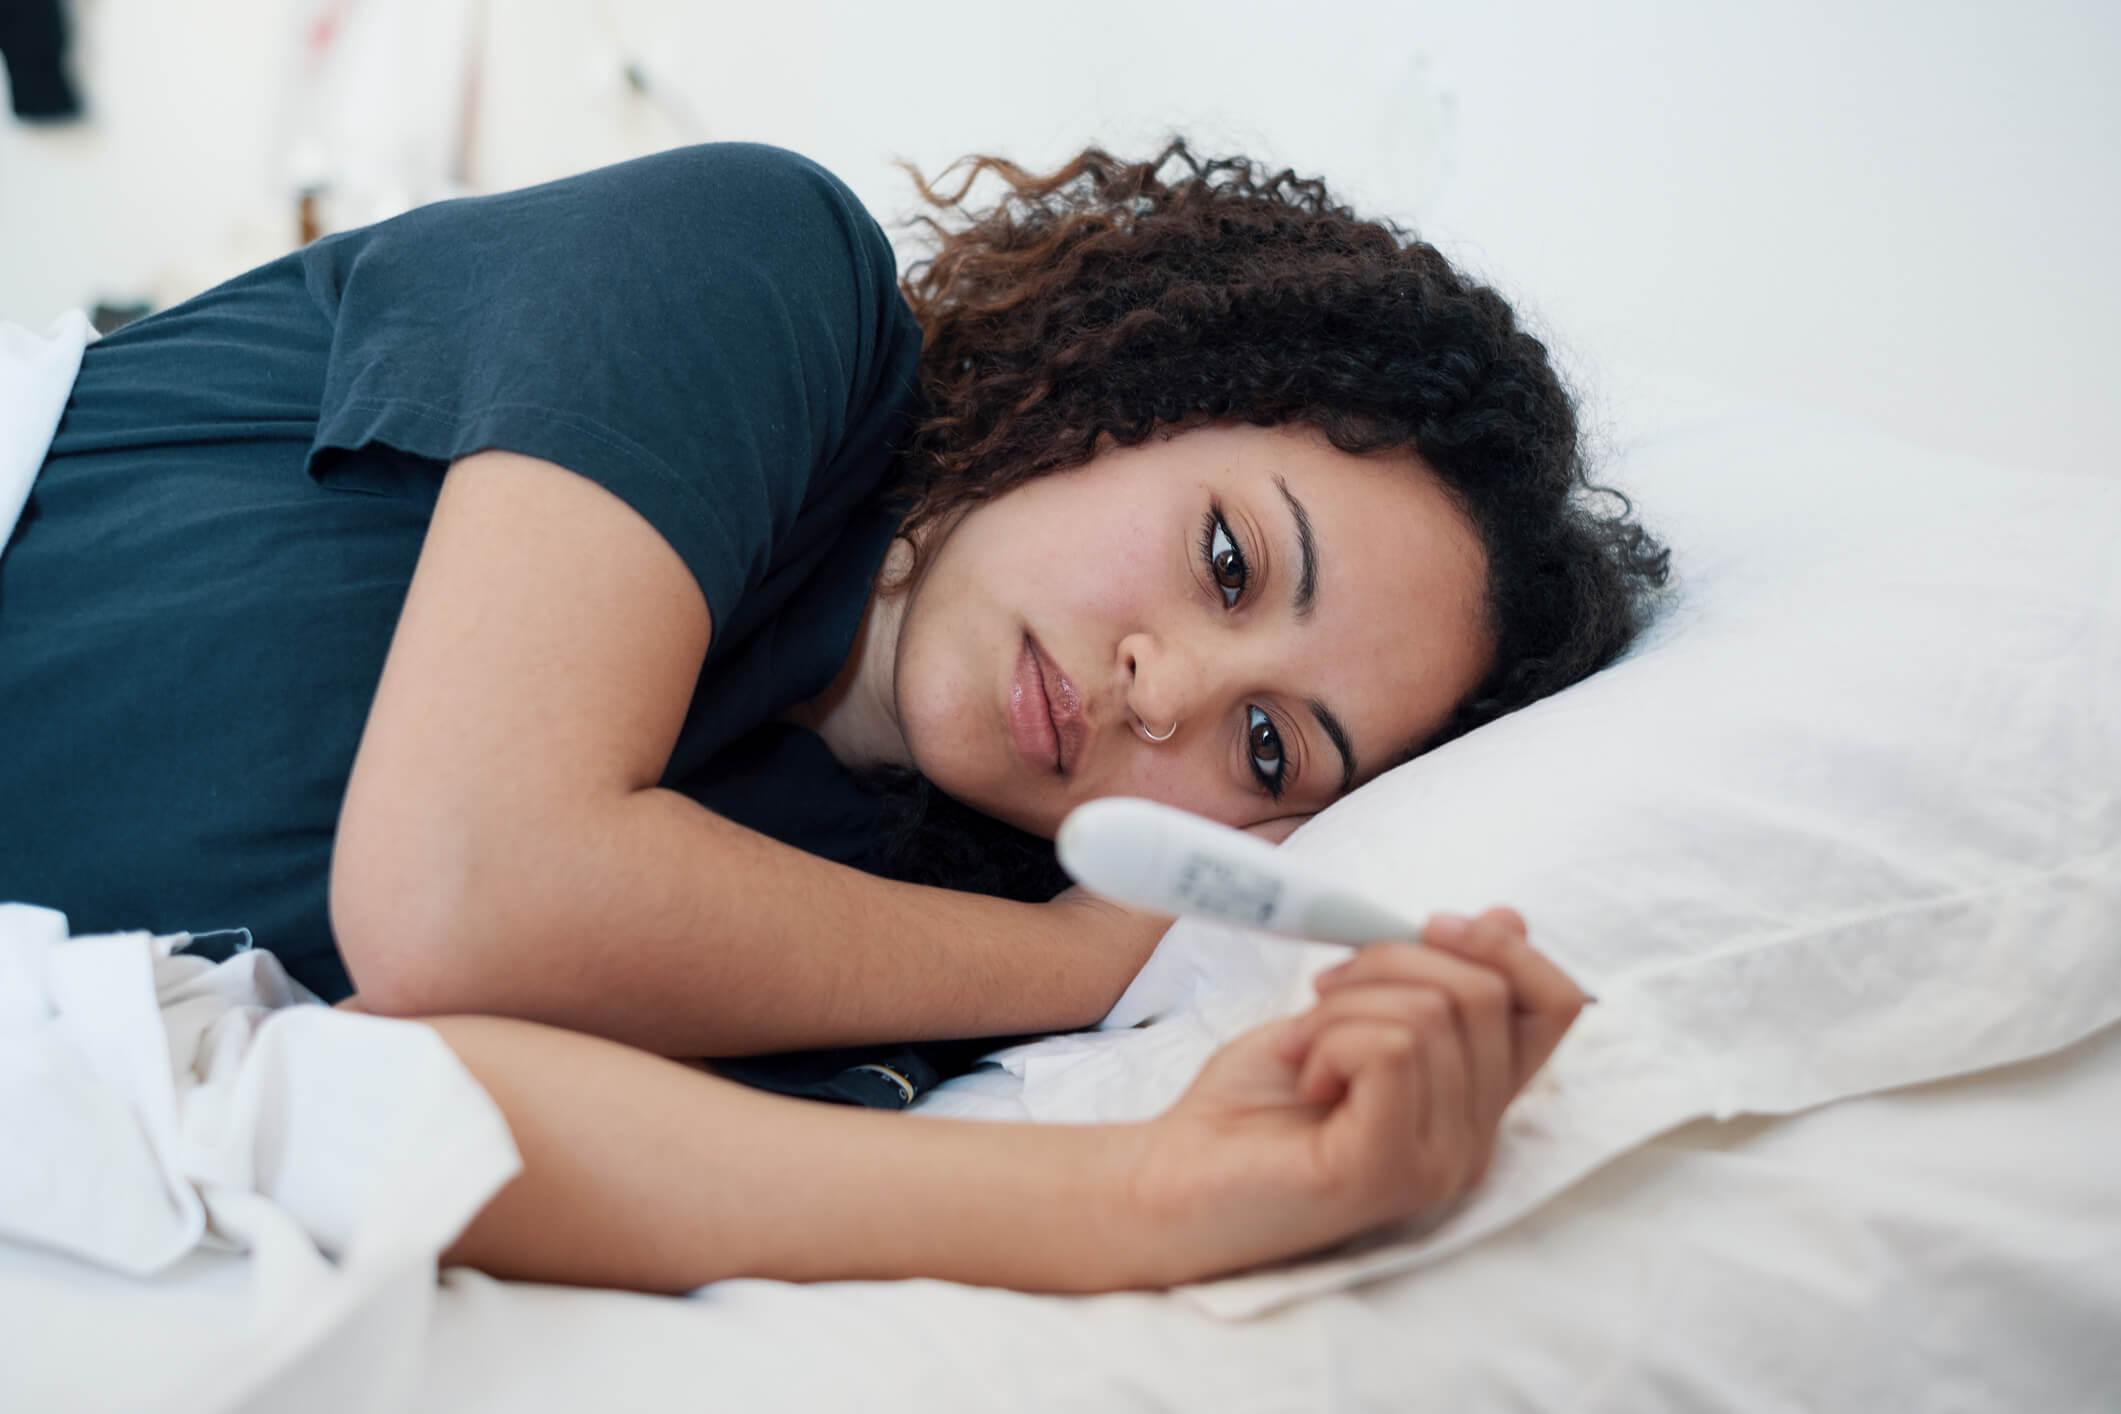 grippe A ou grippe B